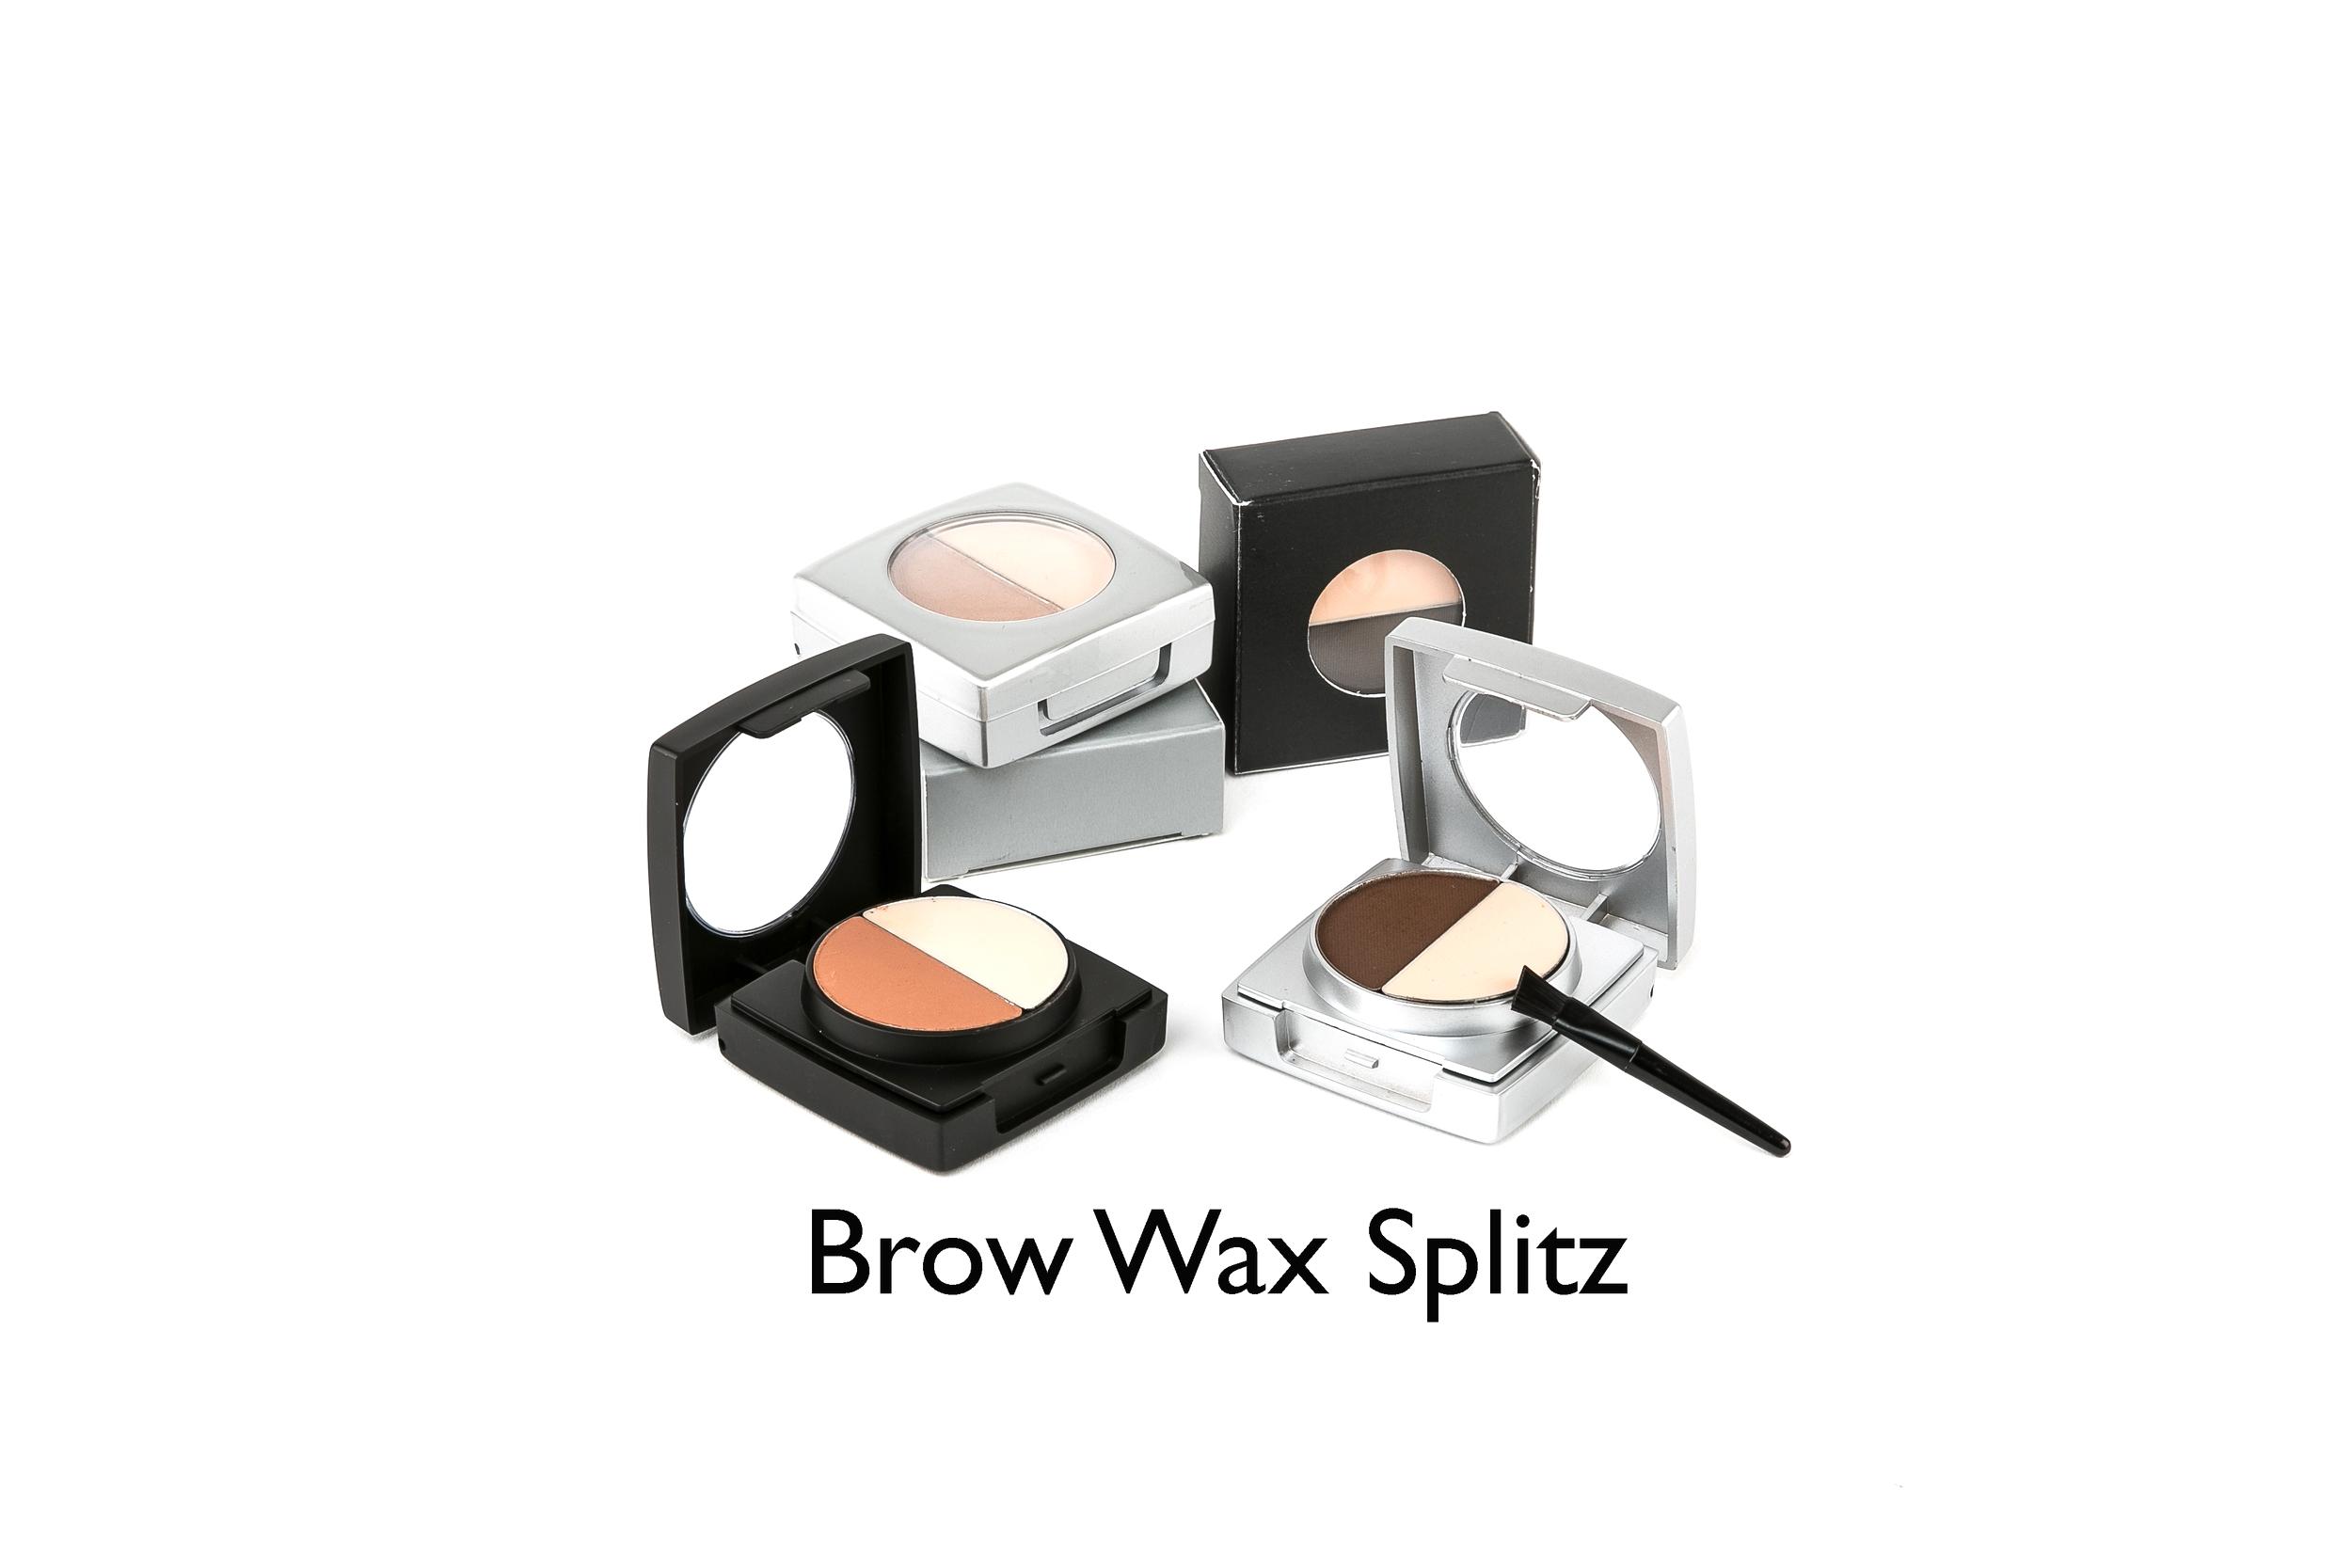 Brow Wax Splitz